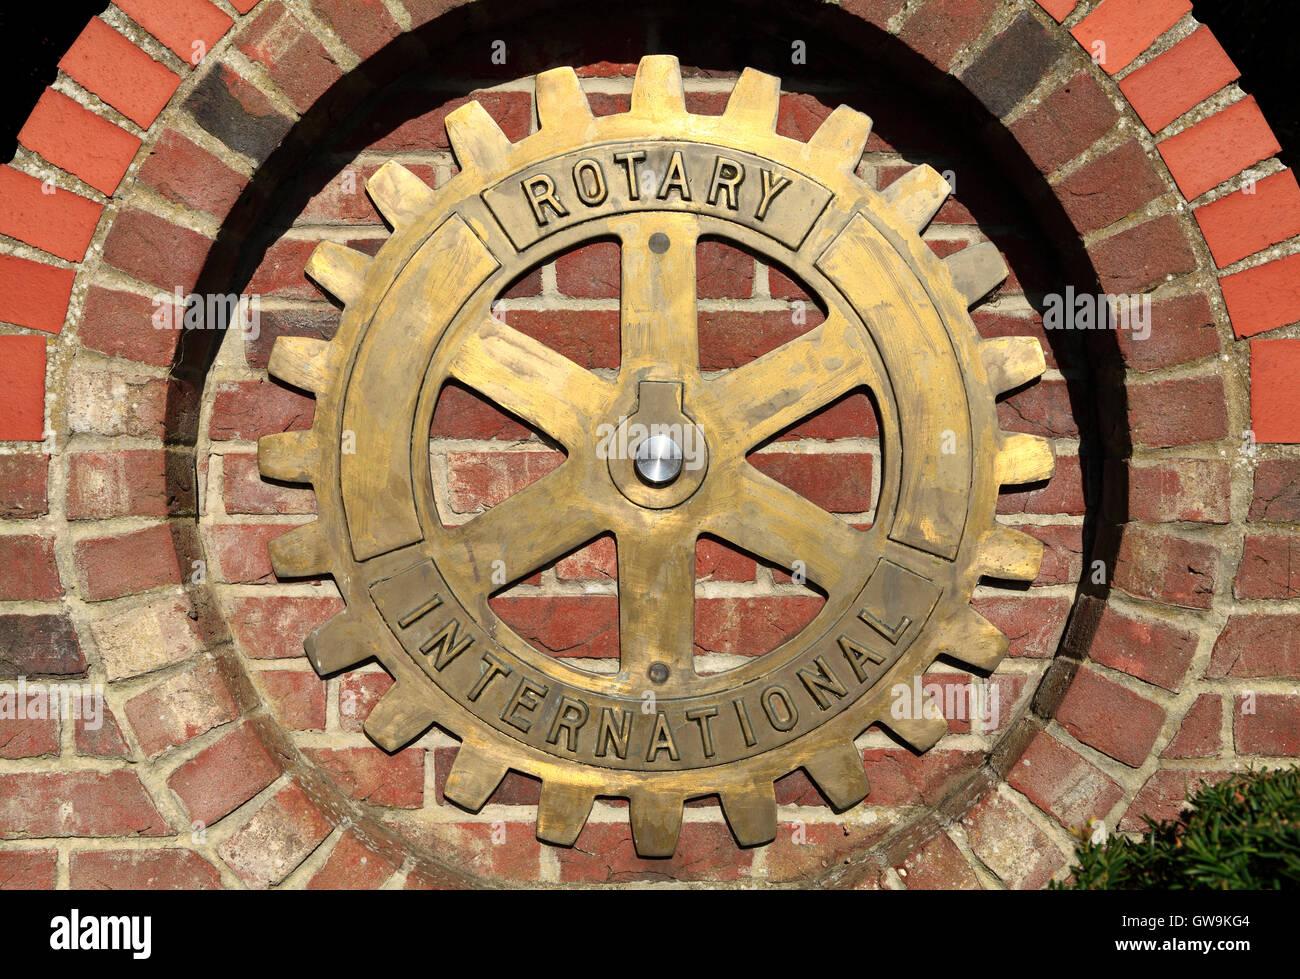 Rotary International, logo, insignia, badge, Hunstanton Norfolk England UK club clubs - Stock Image